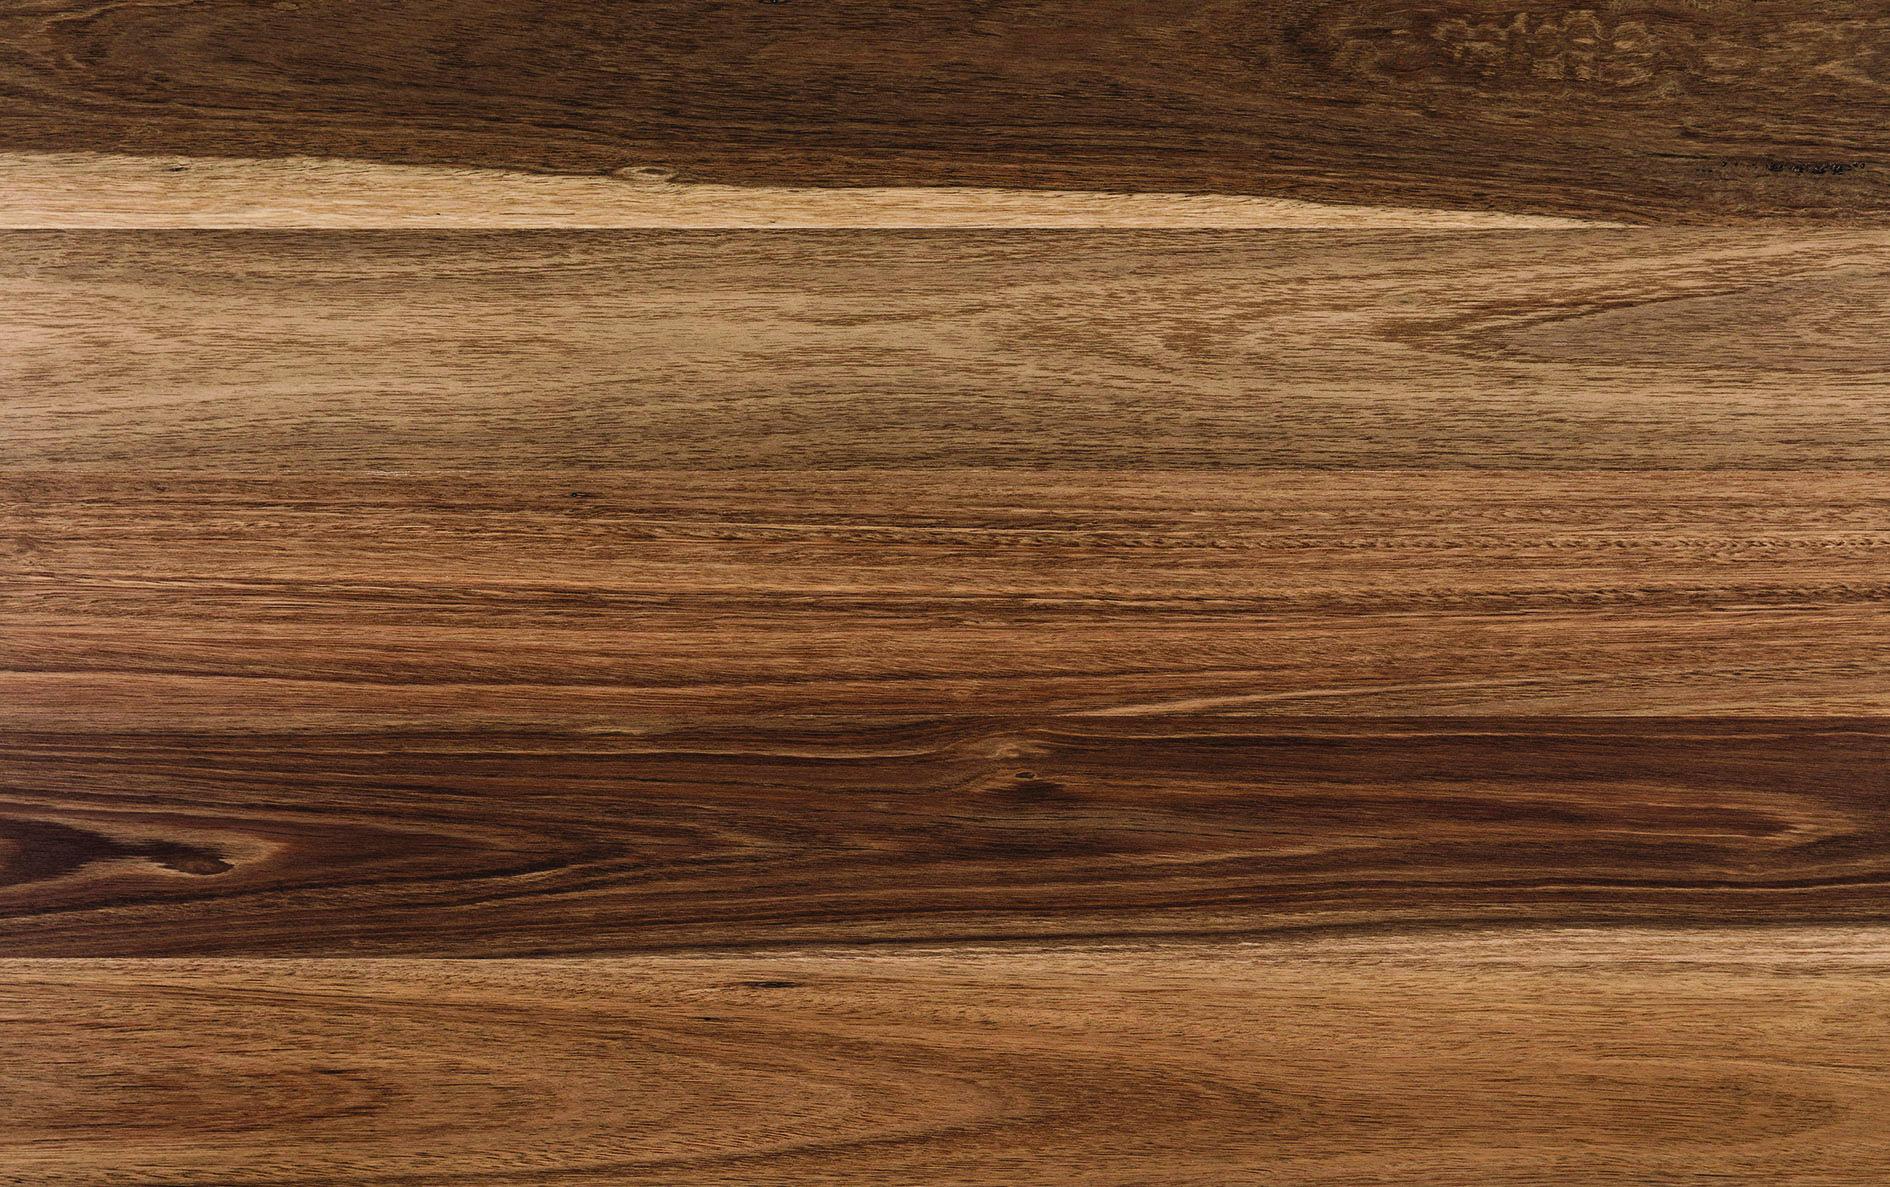 Metallon Engineered Hardwood Flooring Boral Timber